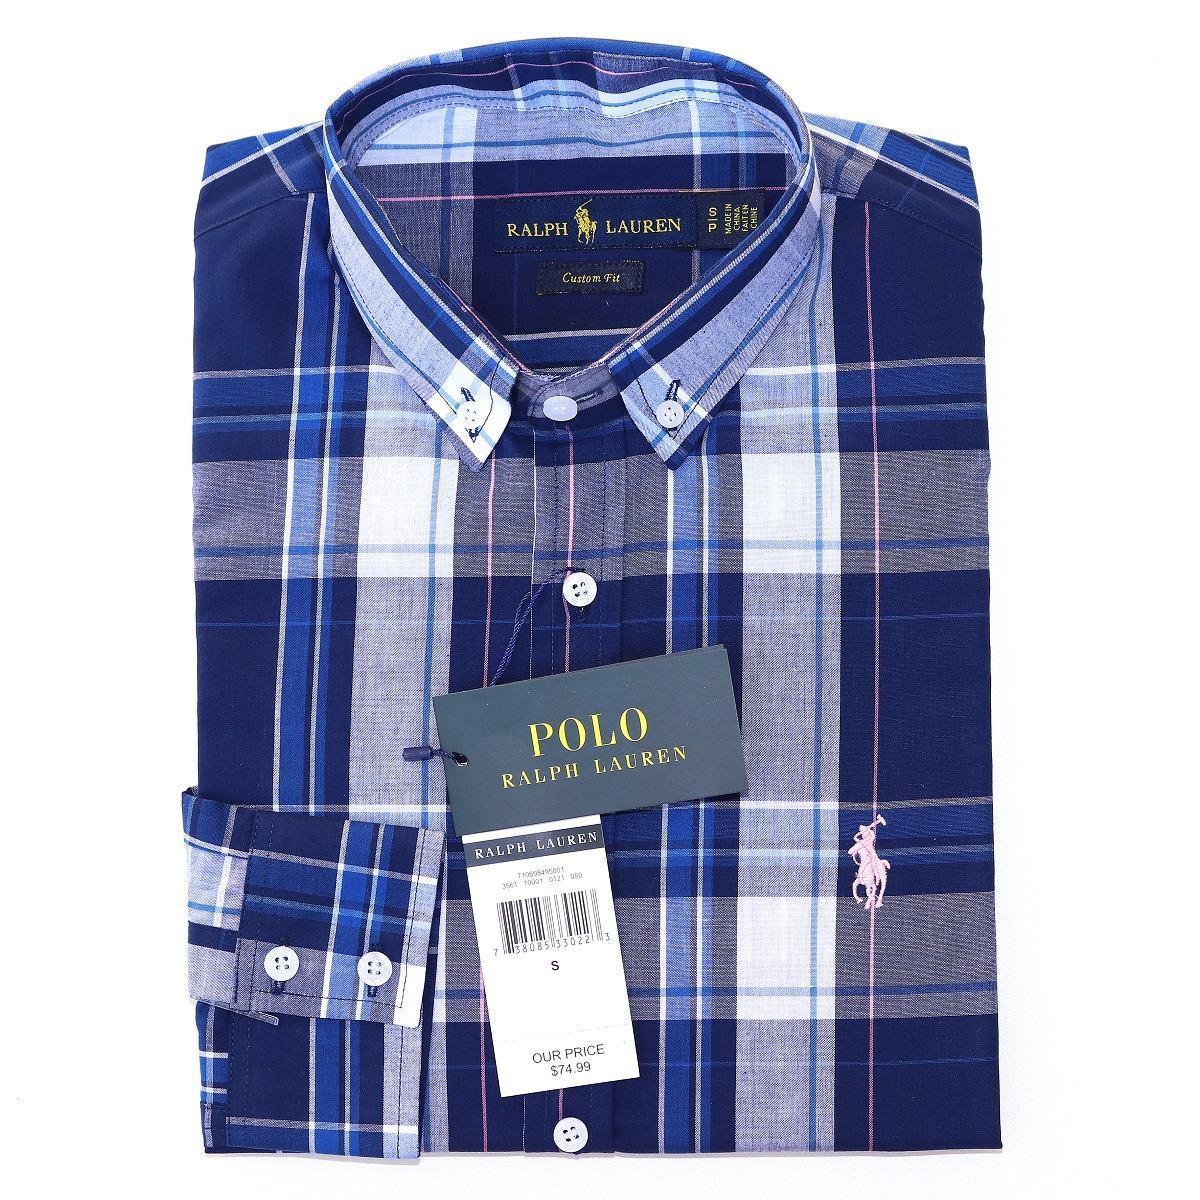 camisa social ralph lauren xadrez azul bordado rosa original. Carregando  zoom. 75ac7a78488